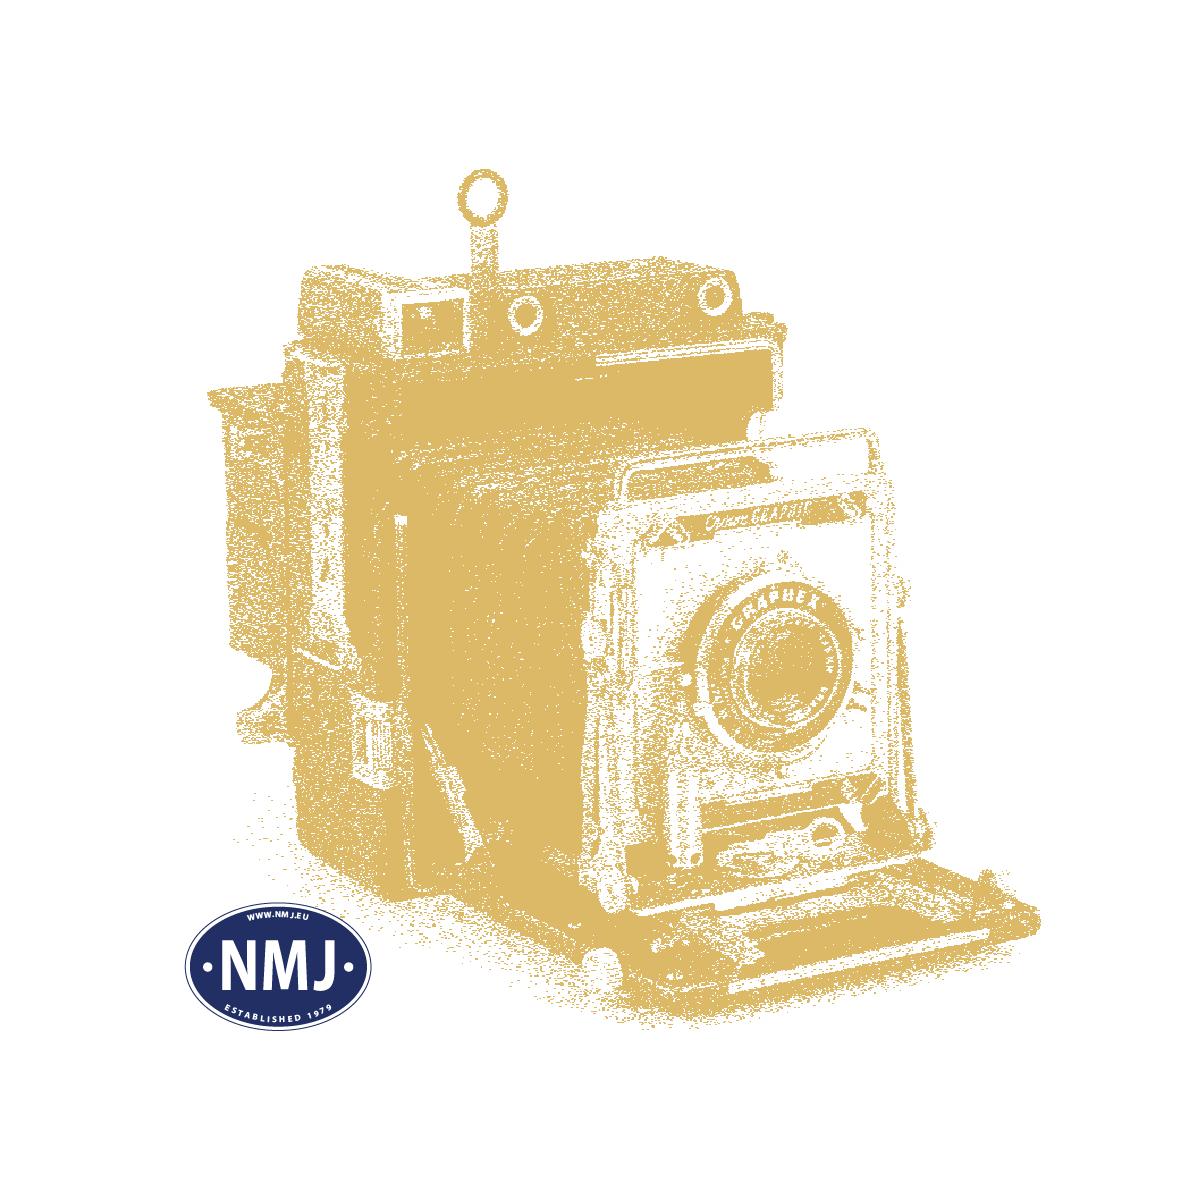 ESU51995 - Adapterkabel Loksound Micro V5, NEXT18 til NEM652